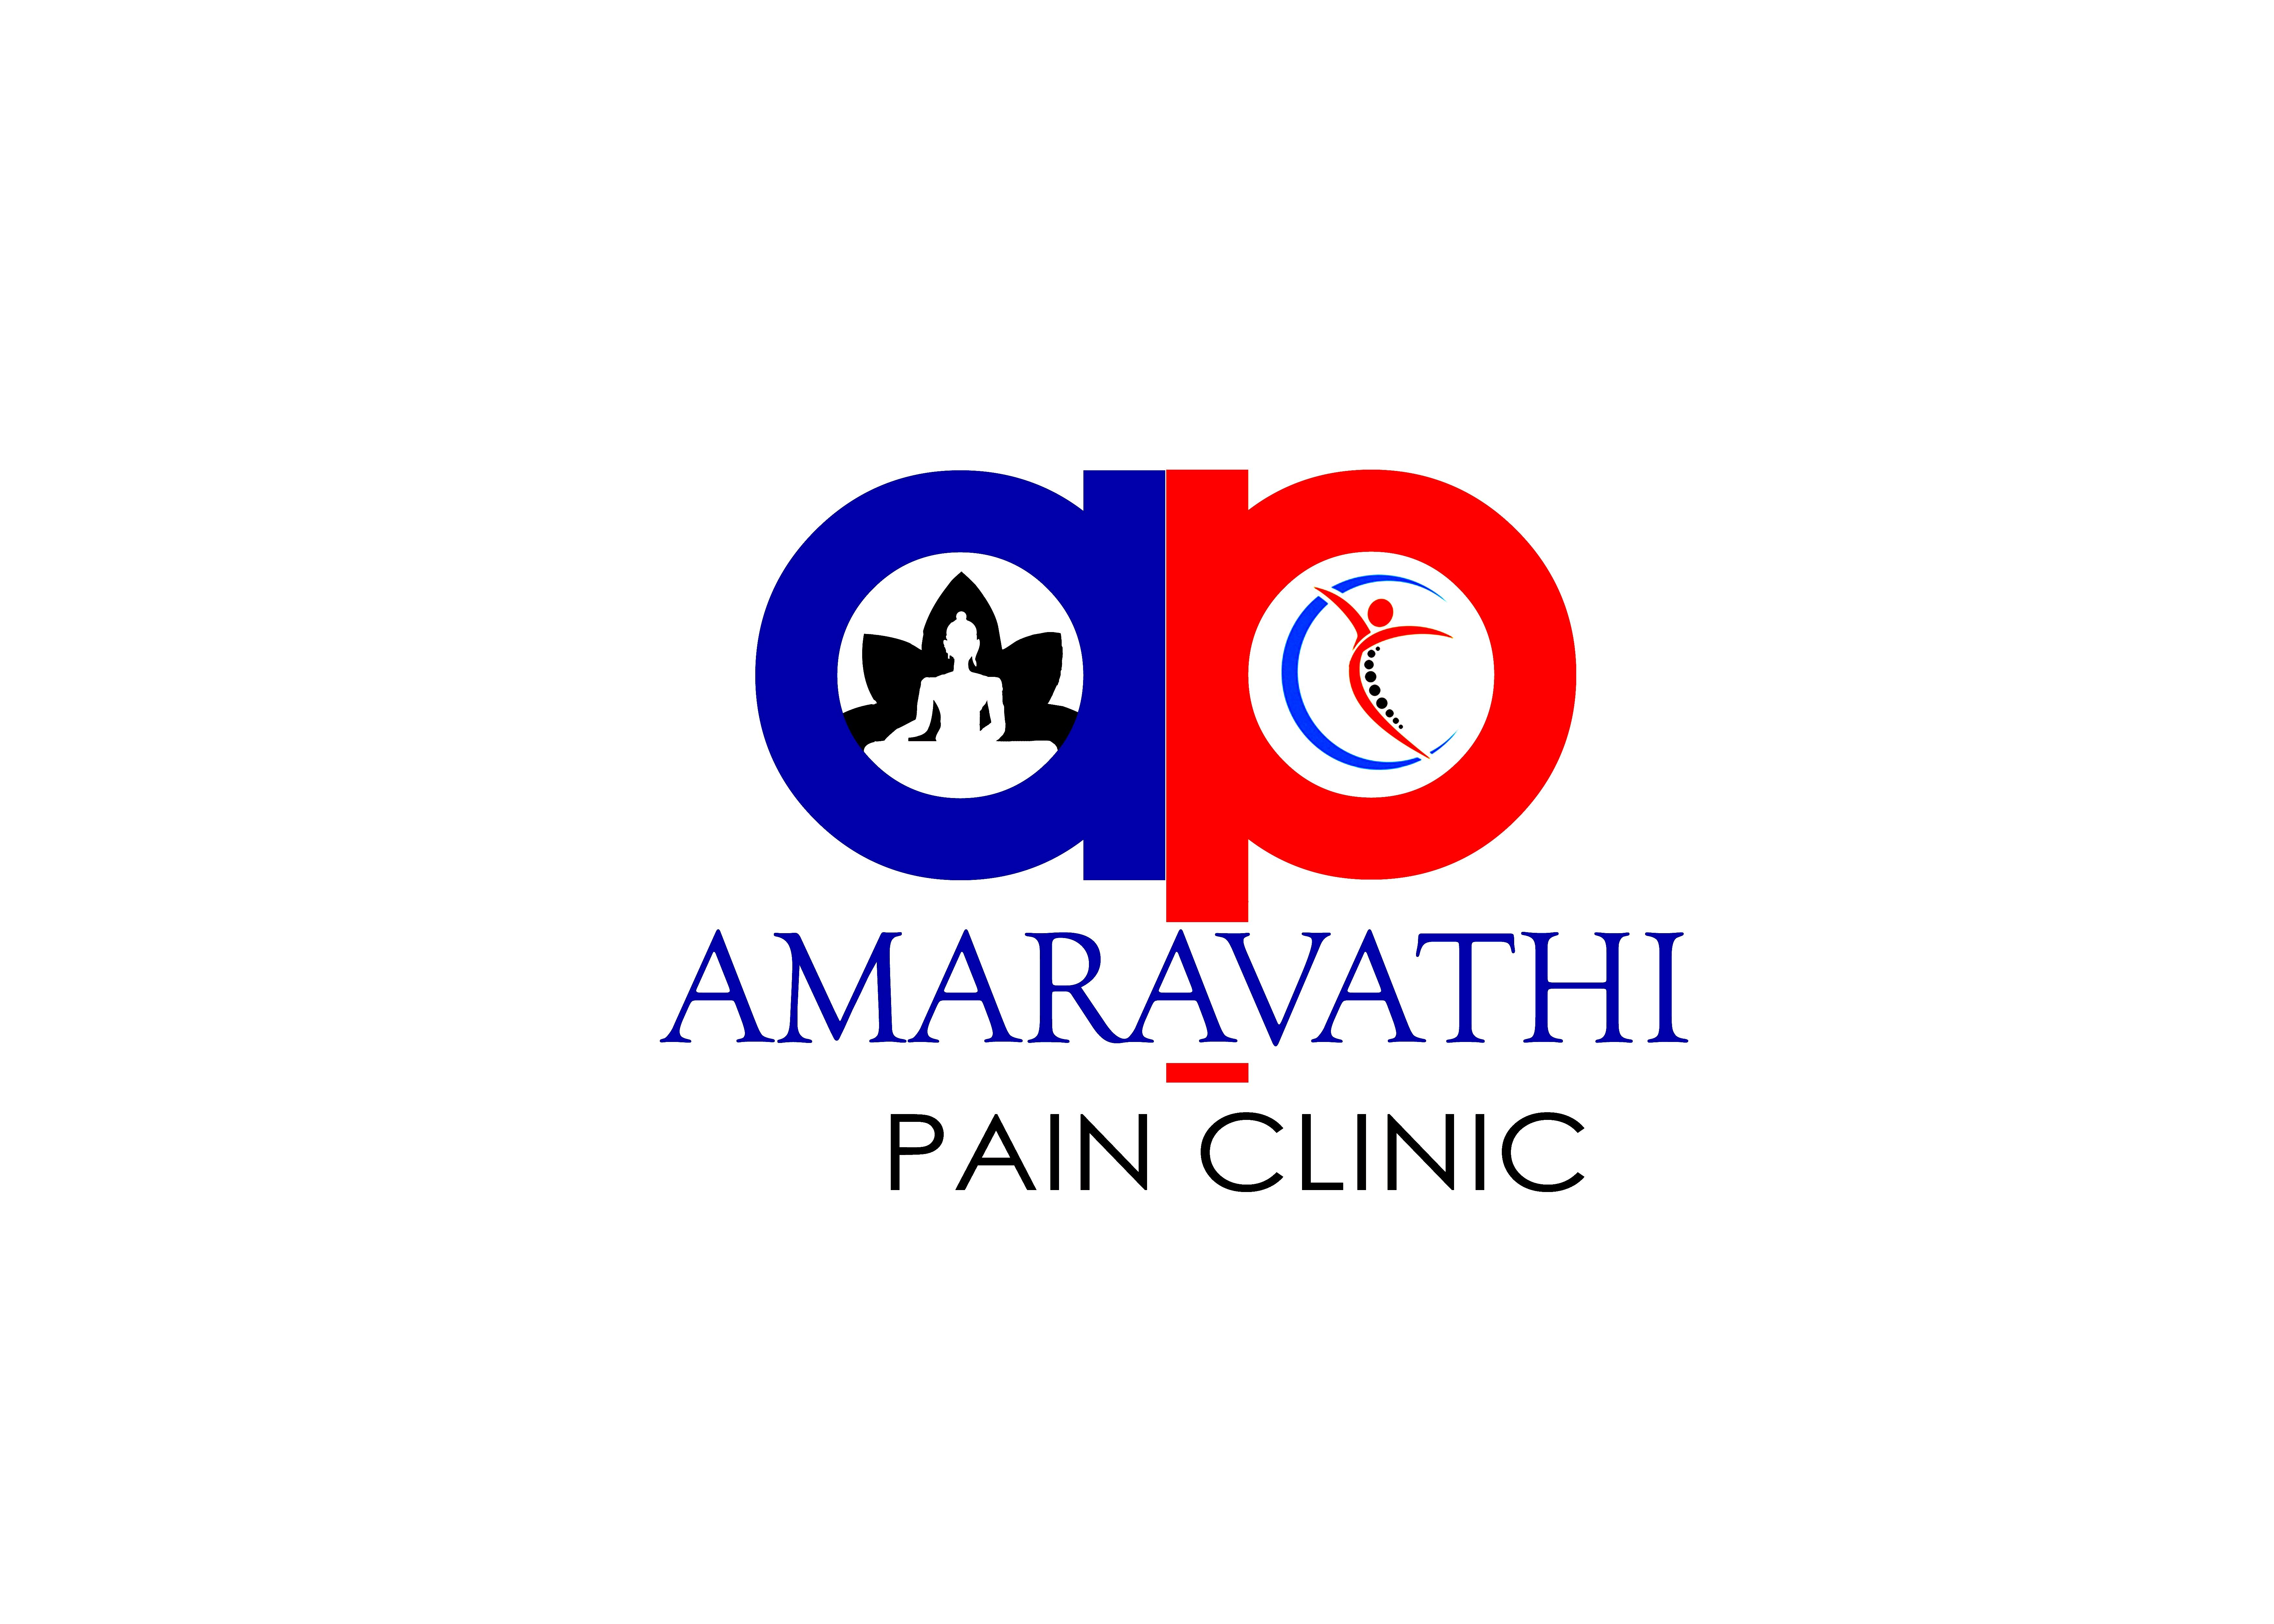 Amaravati Pain Clinic